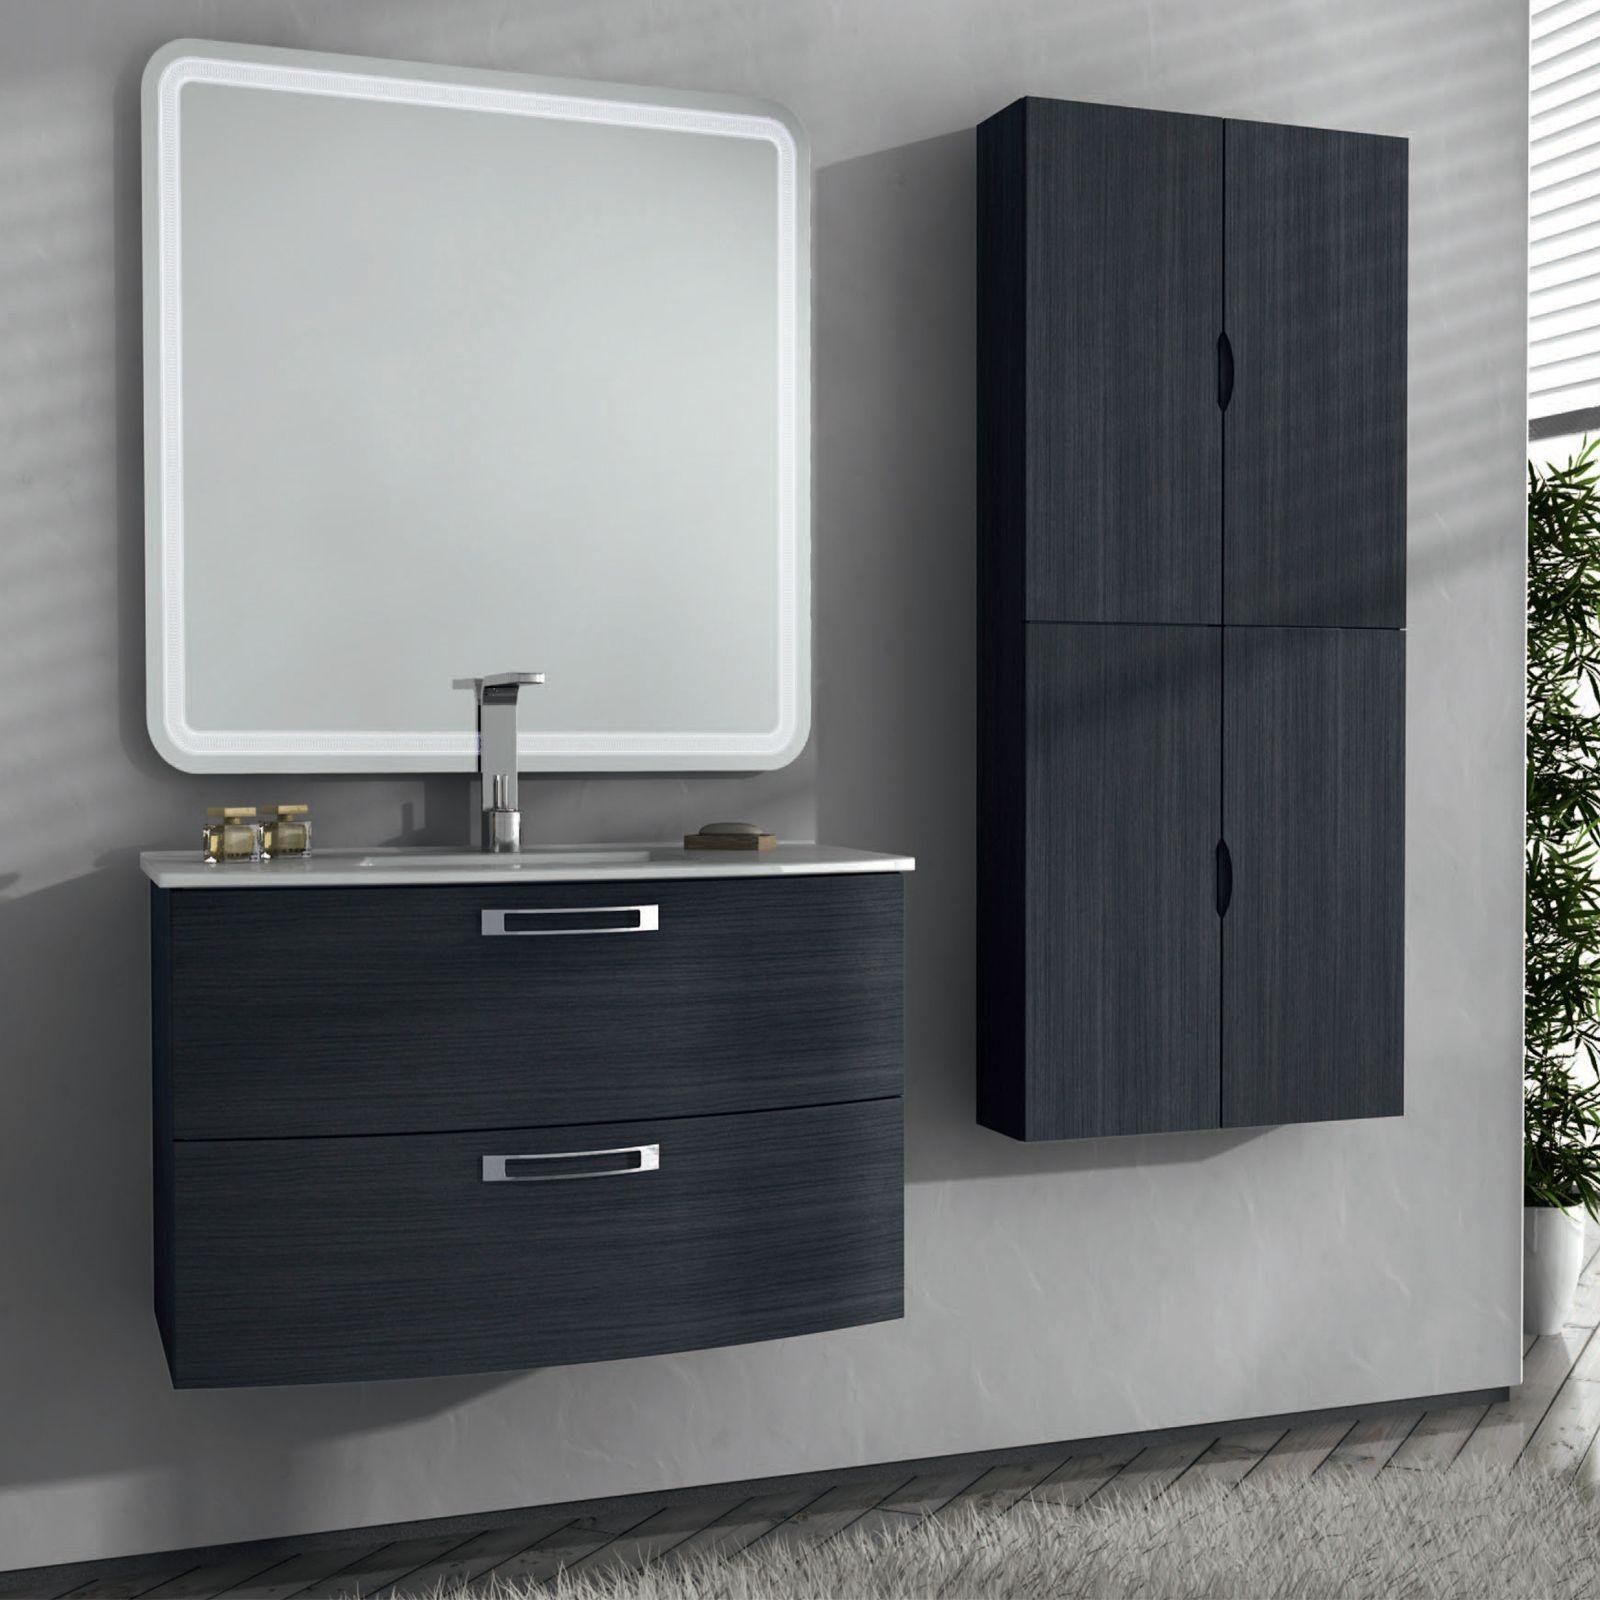 Arredo bagno moderno converse in vari colori bh - Arredo bagno grigio ...